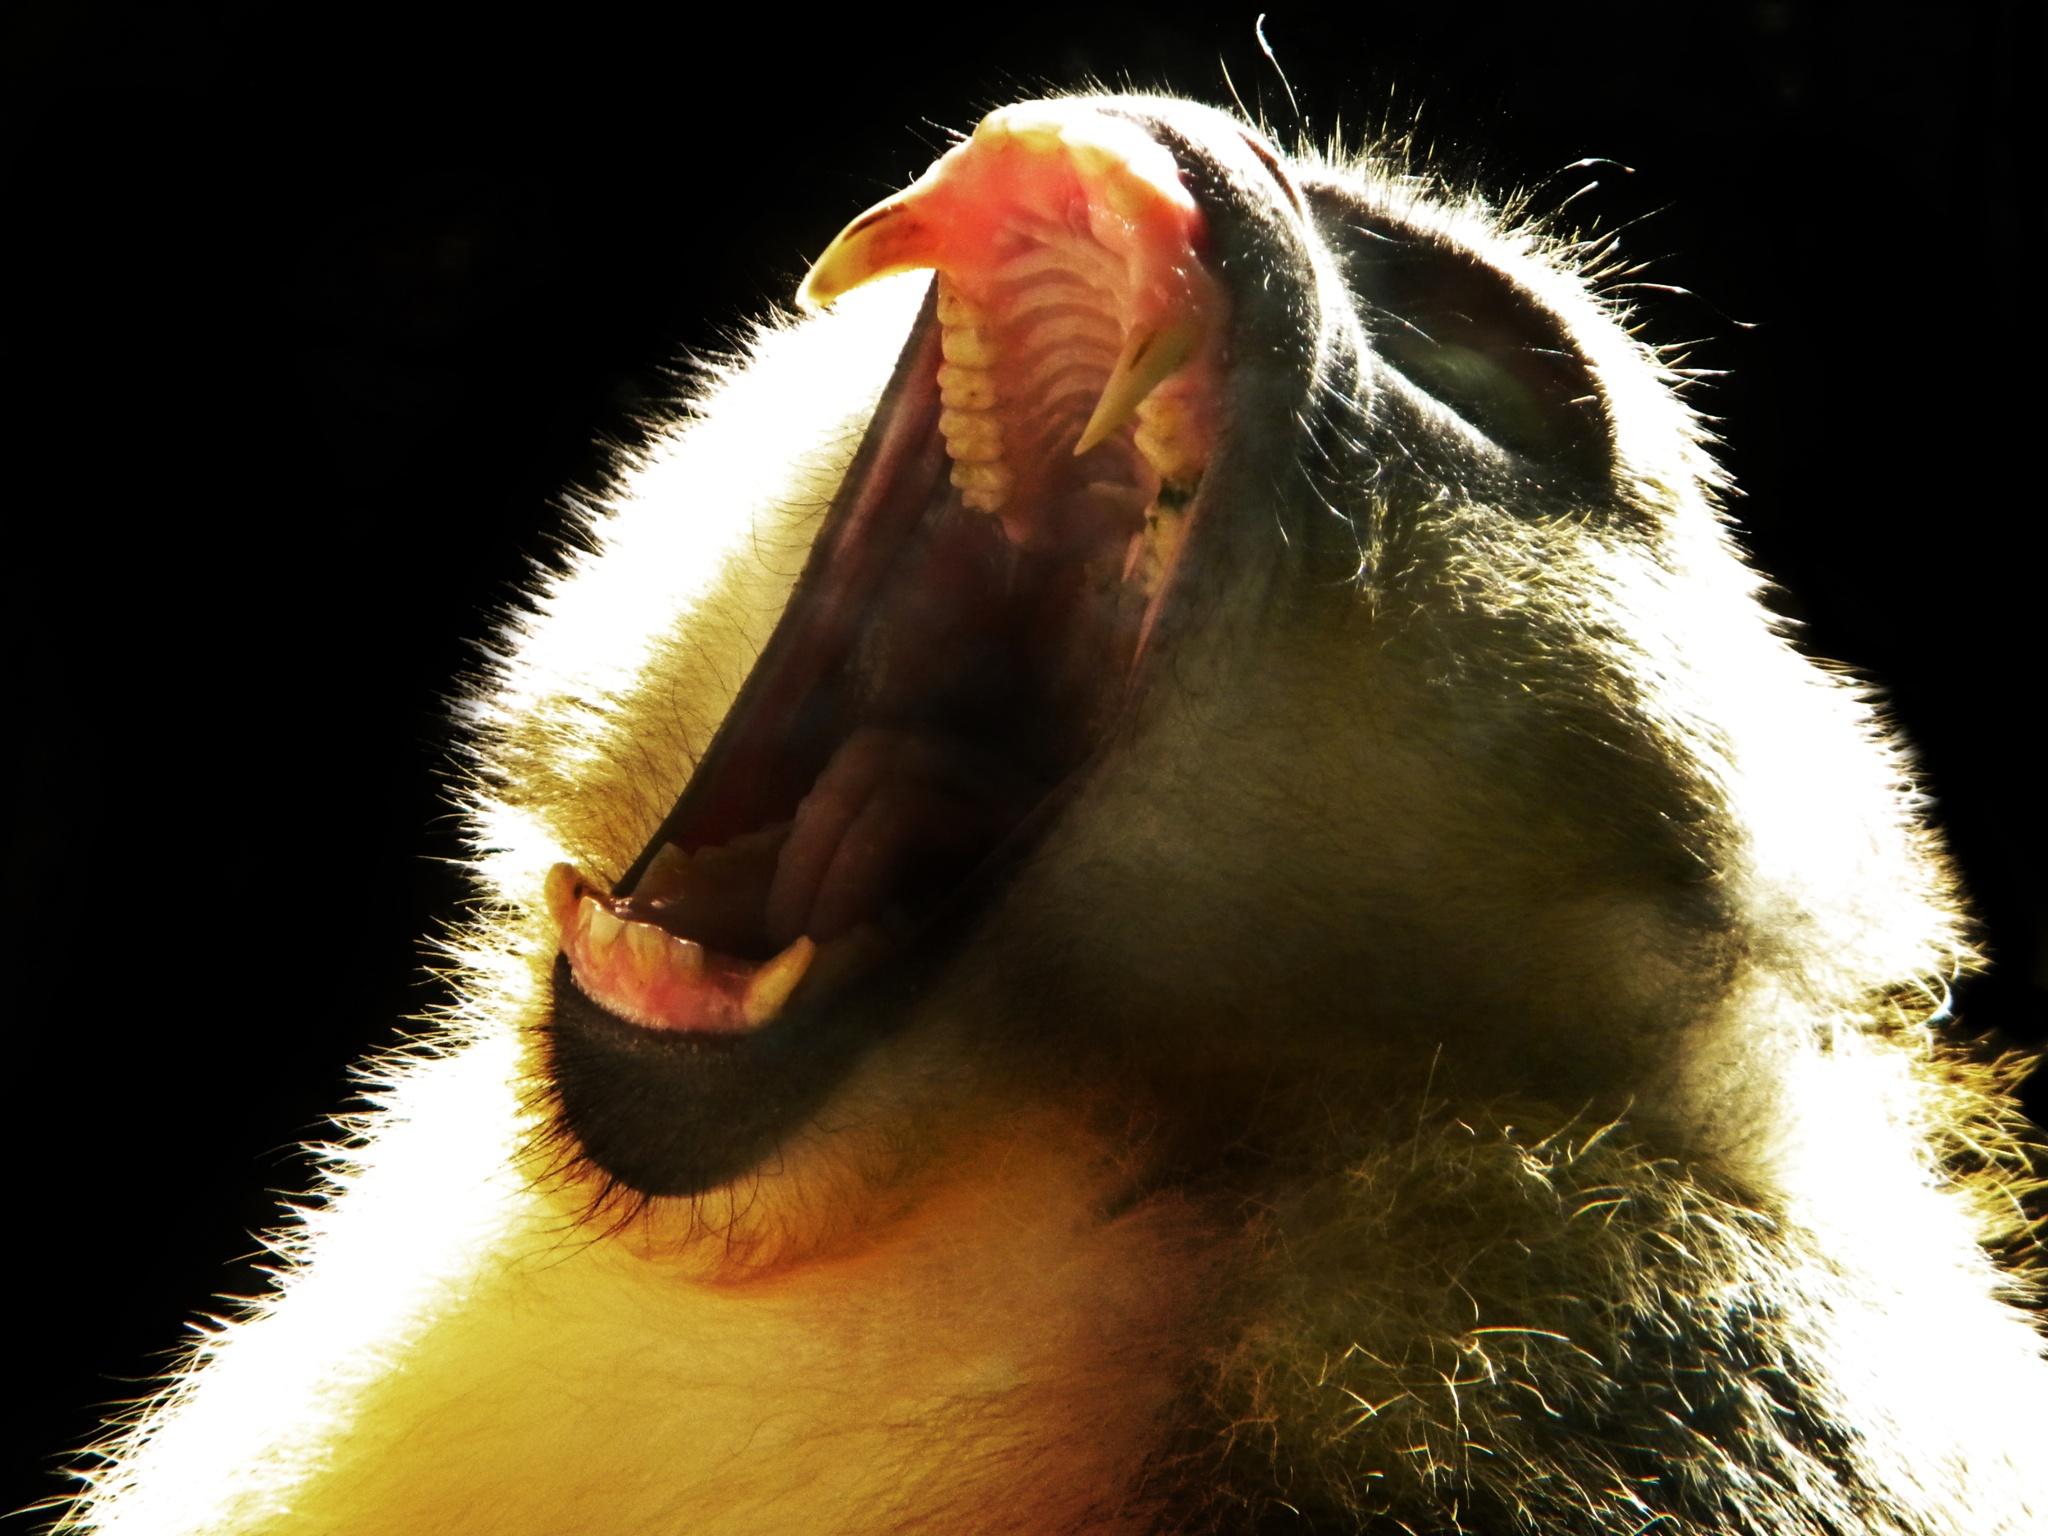 Primal Yawn by Phillip W. Strunk